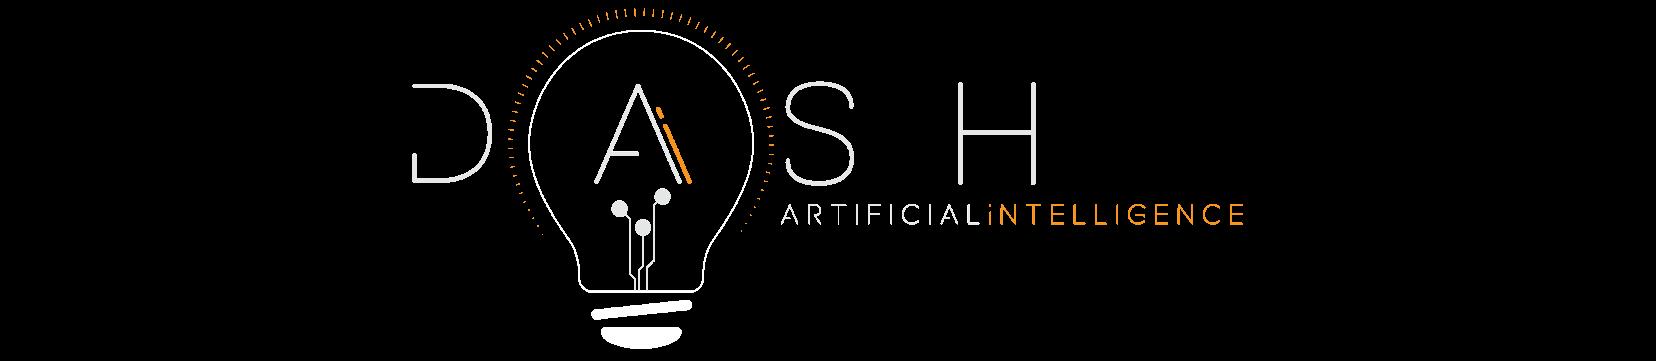 Daish-AI-Trans